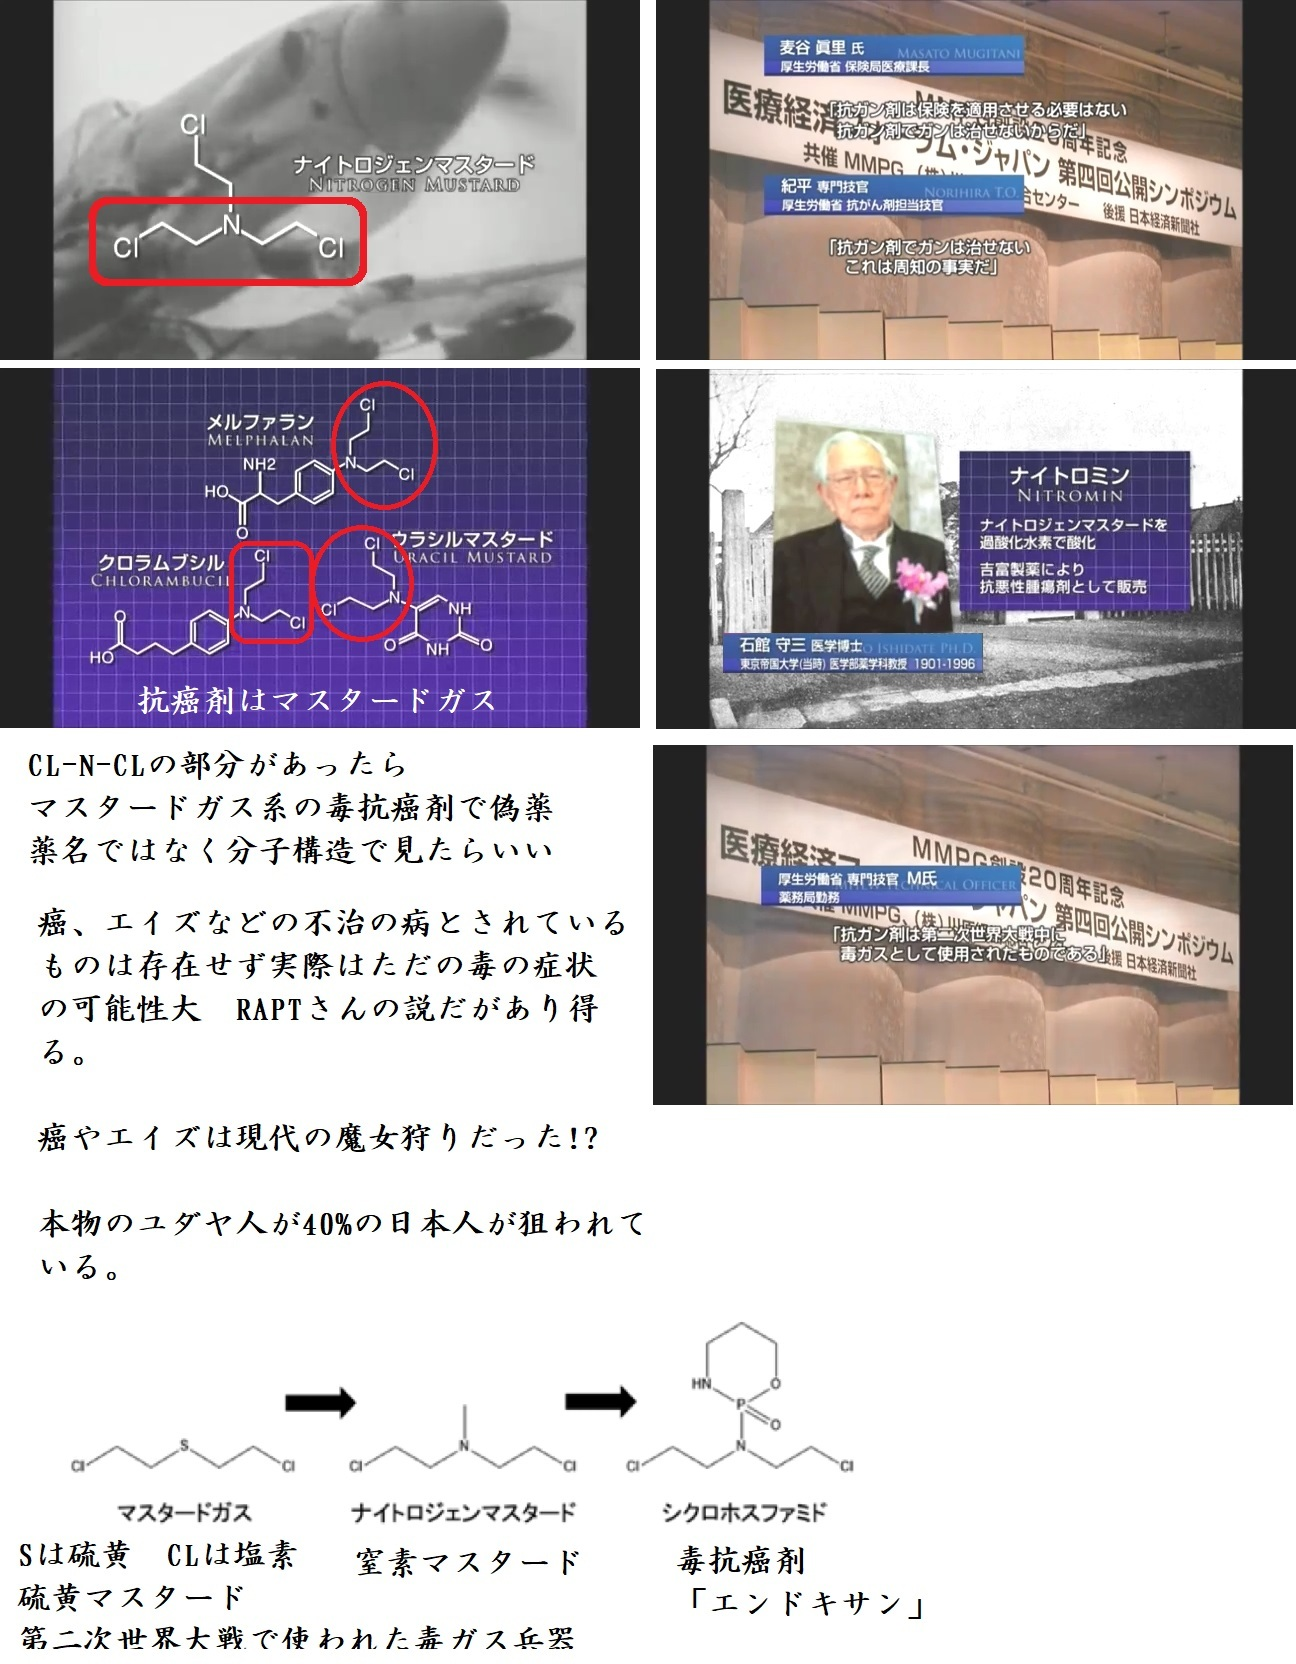 cancer hoax poison anticancer drug255